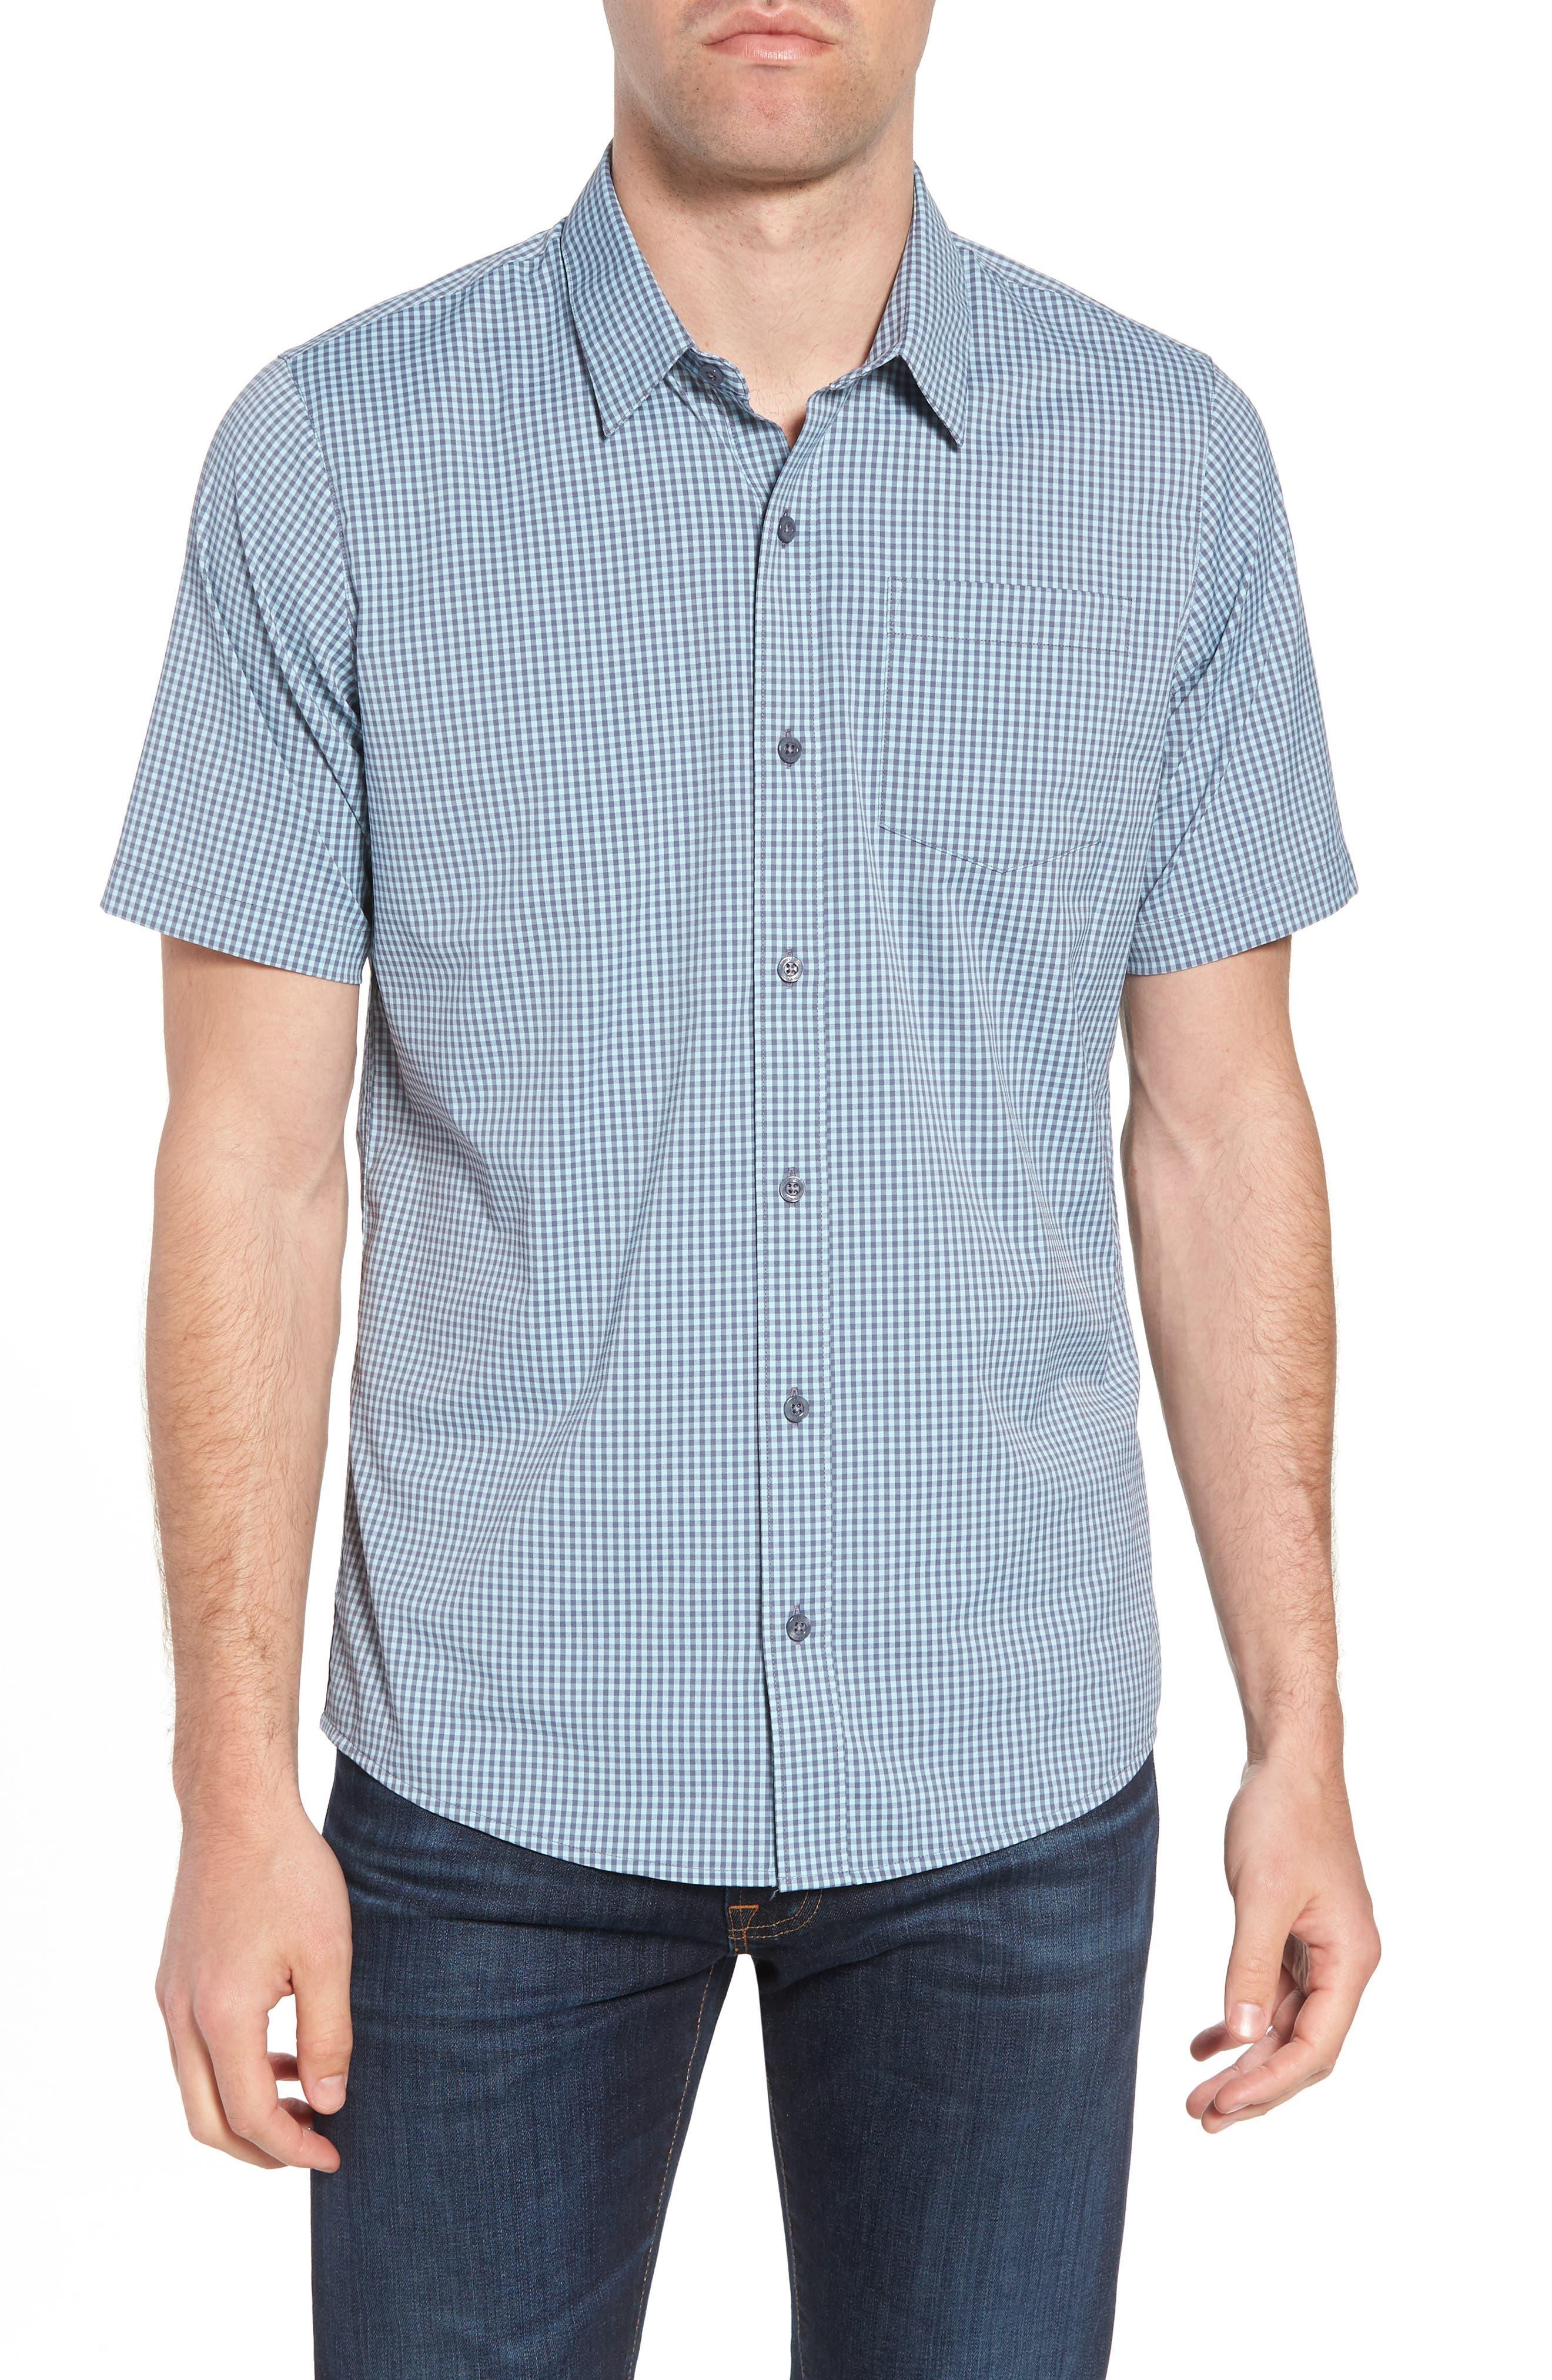 Gygax Regular Fit Sport Shirt,                         Main,                         color, Porcelain Blue